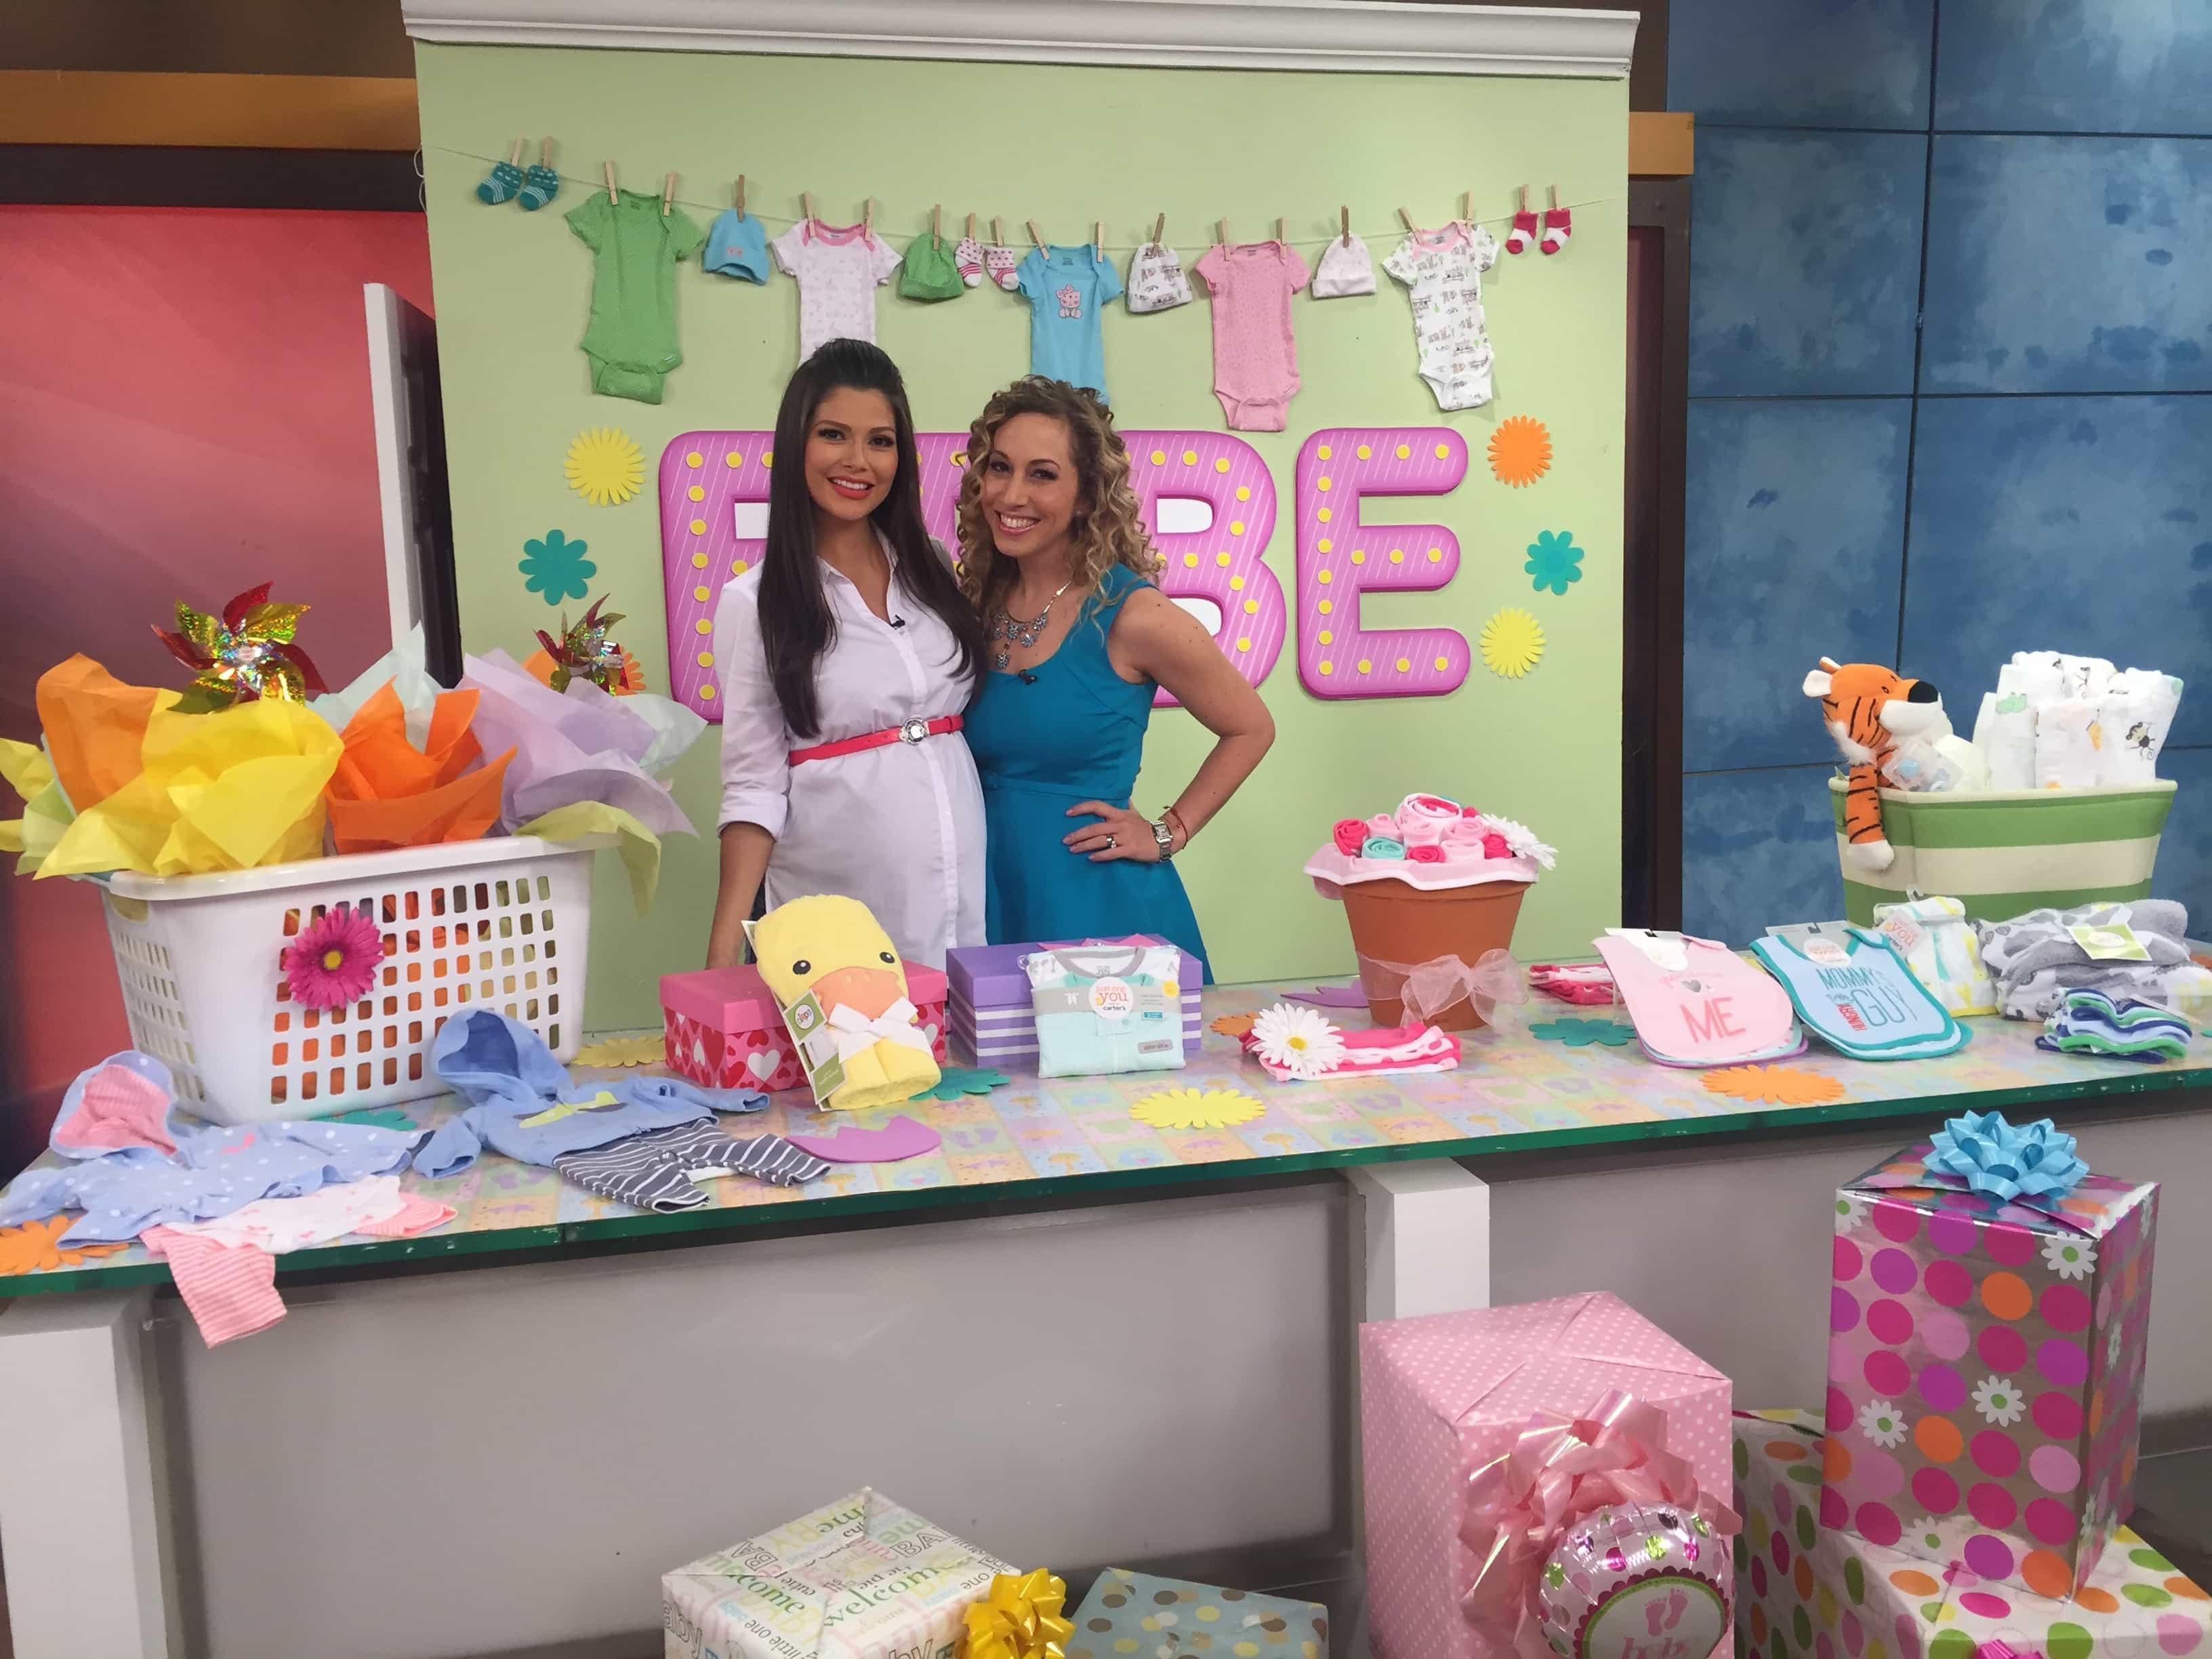 Baby Shower Gift Basket Ideas 3 Super Easy Diy Ideas